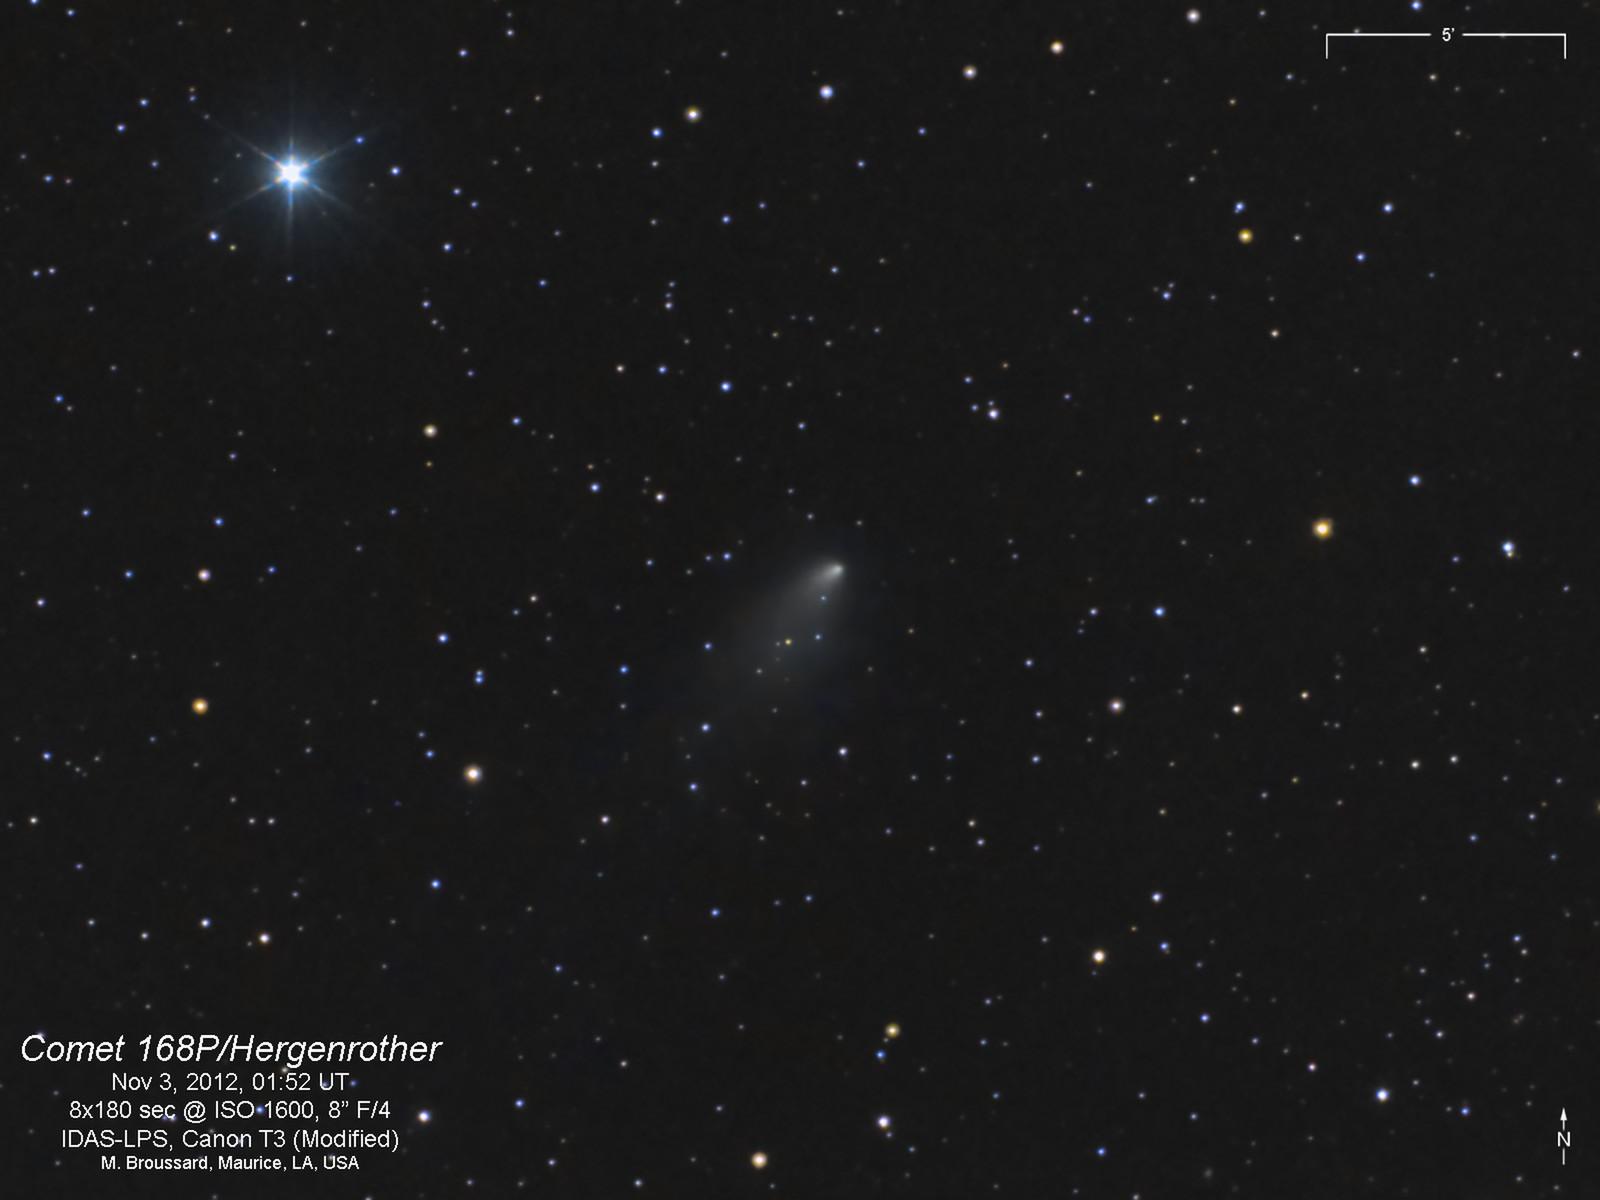 Comet 168P/Hergenrother on Nov 3, 2012